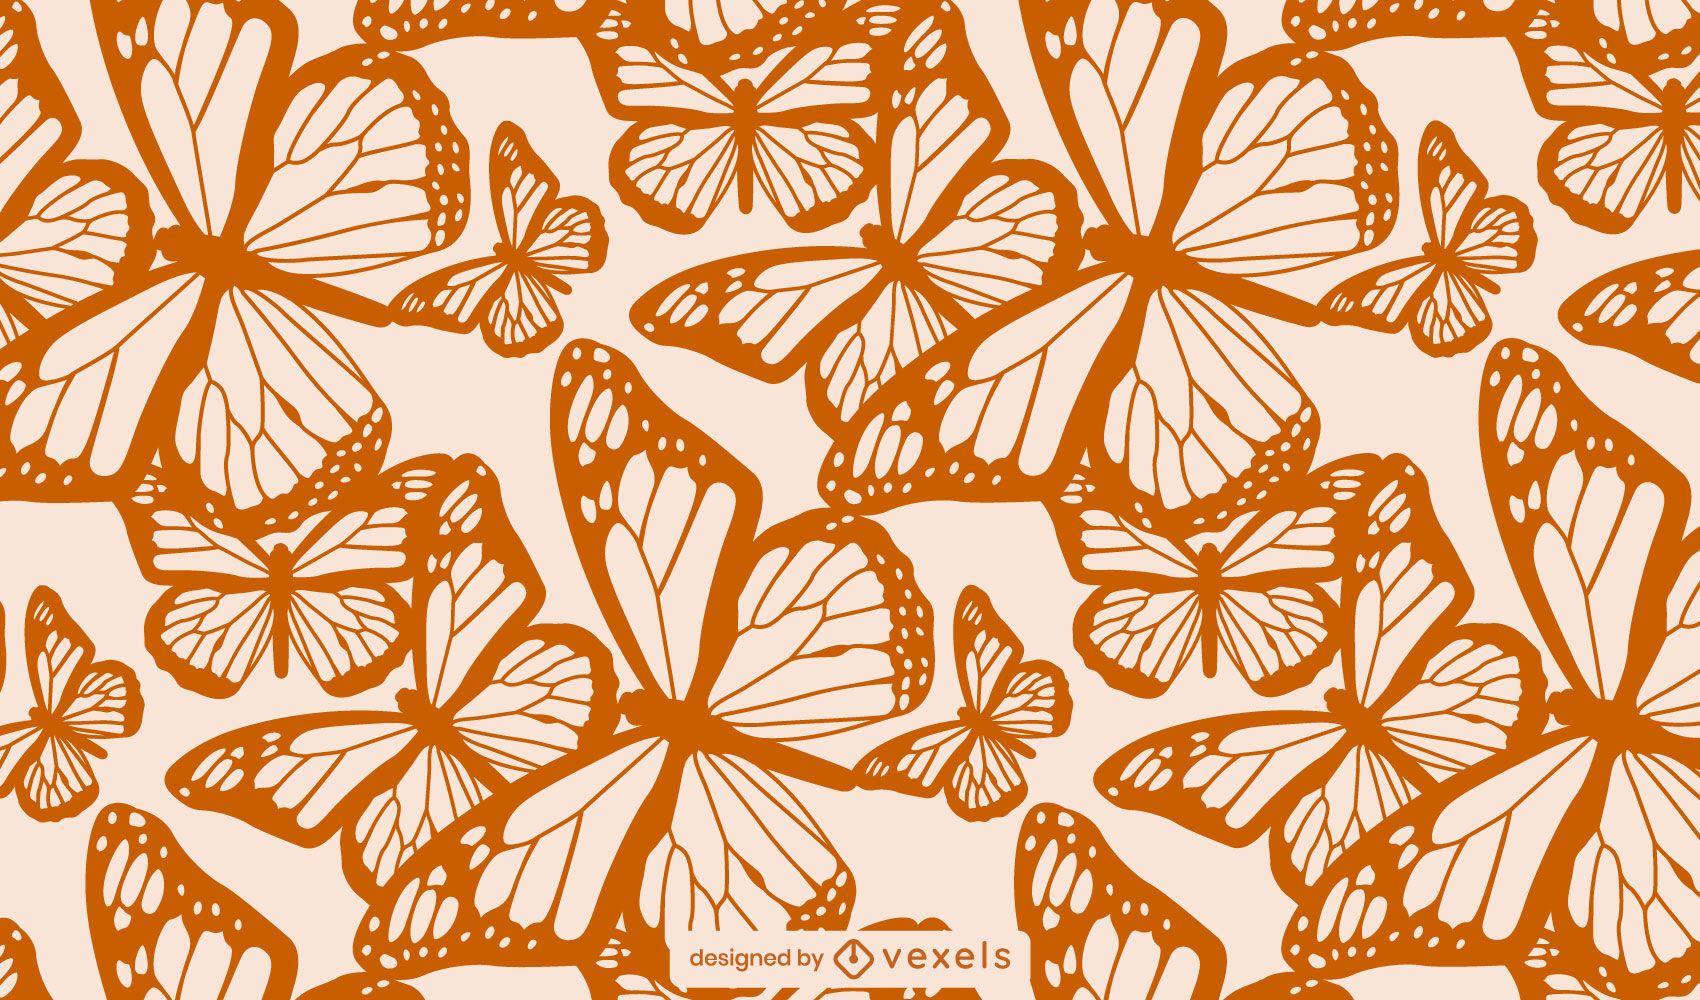 Patr?n de mosaico de textura de mariposa